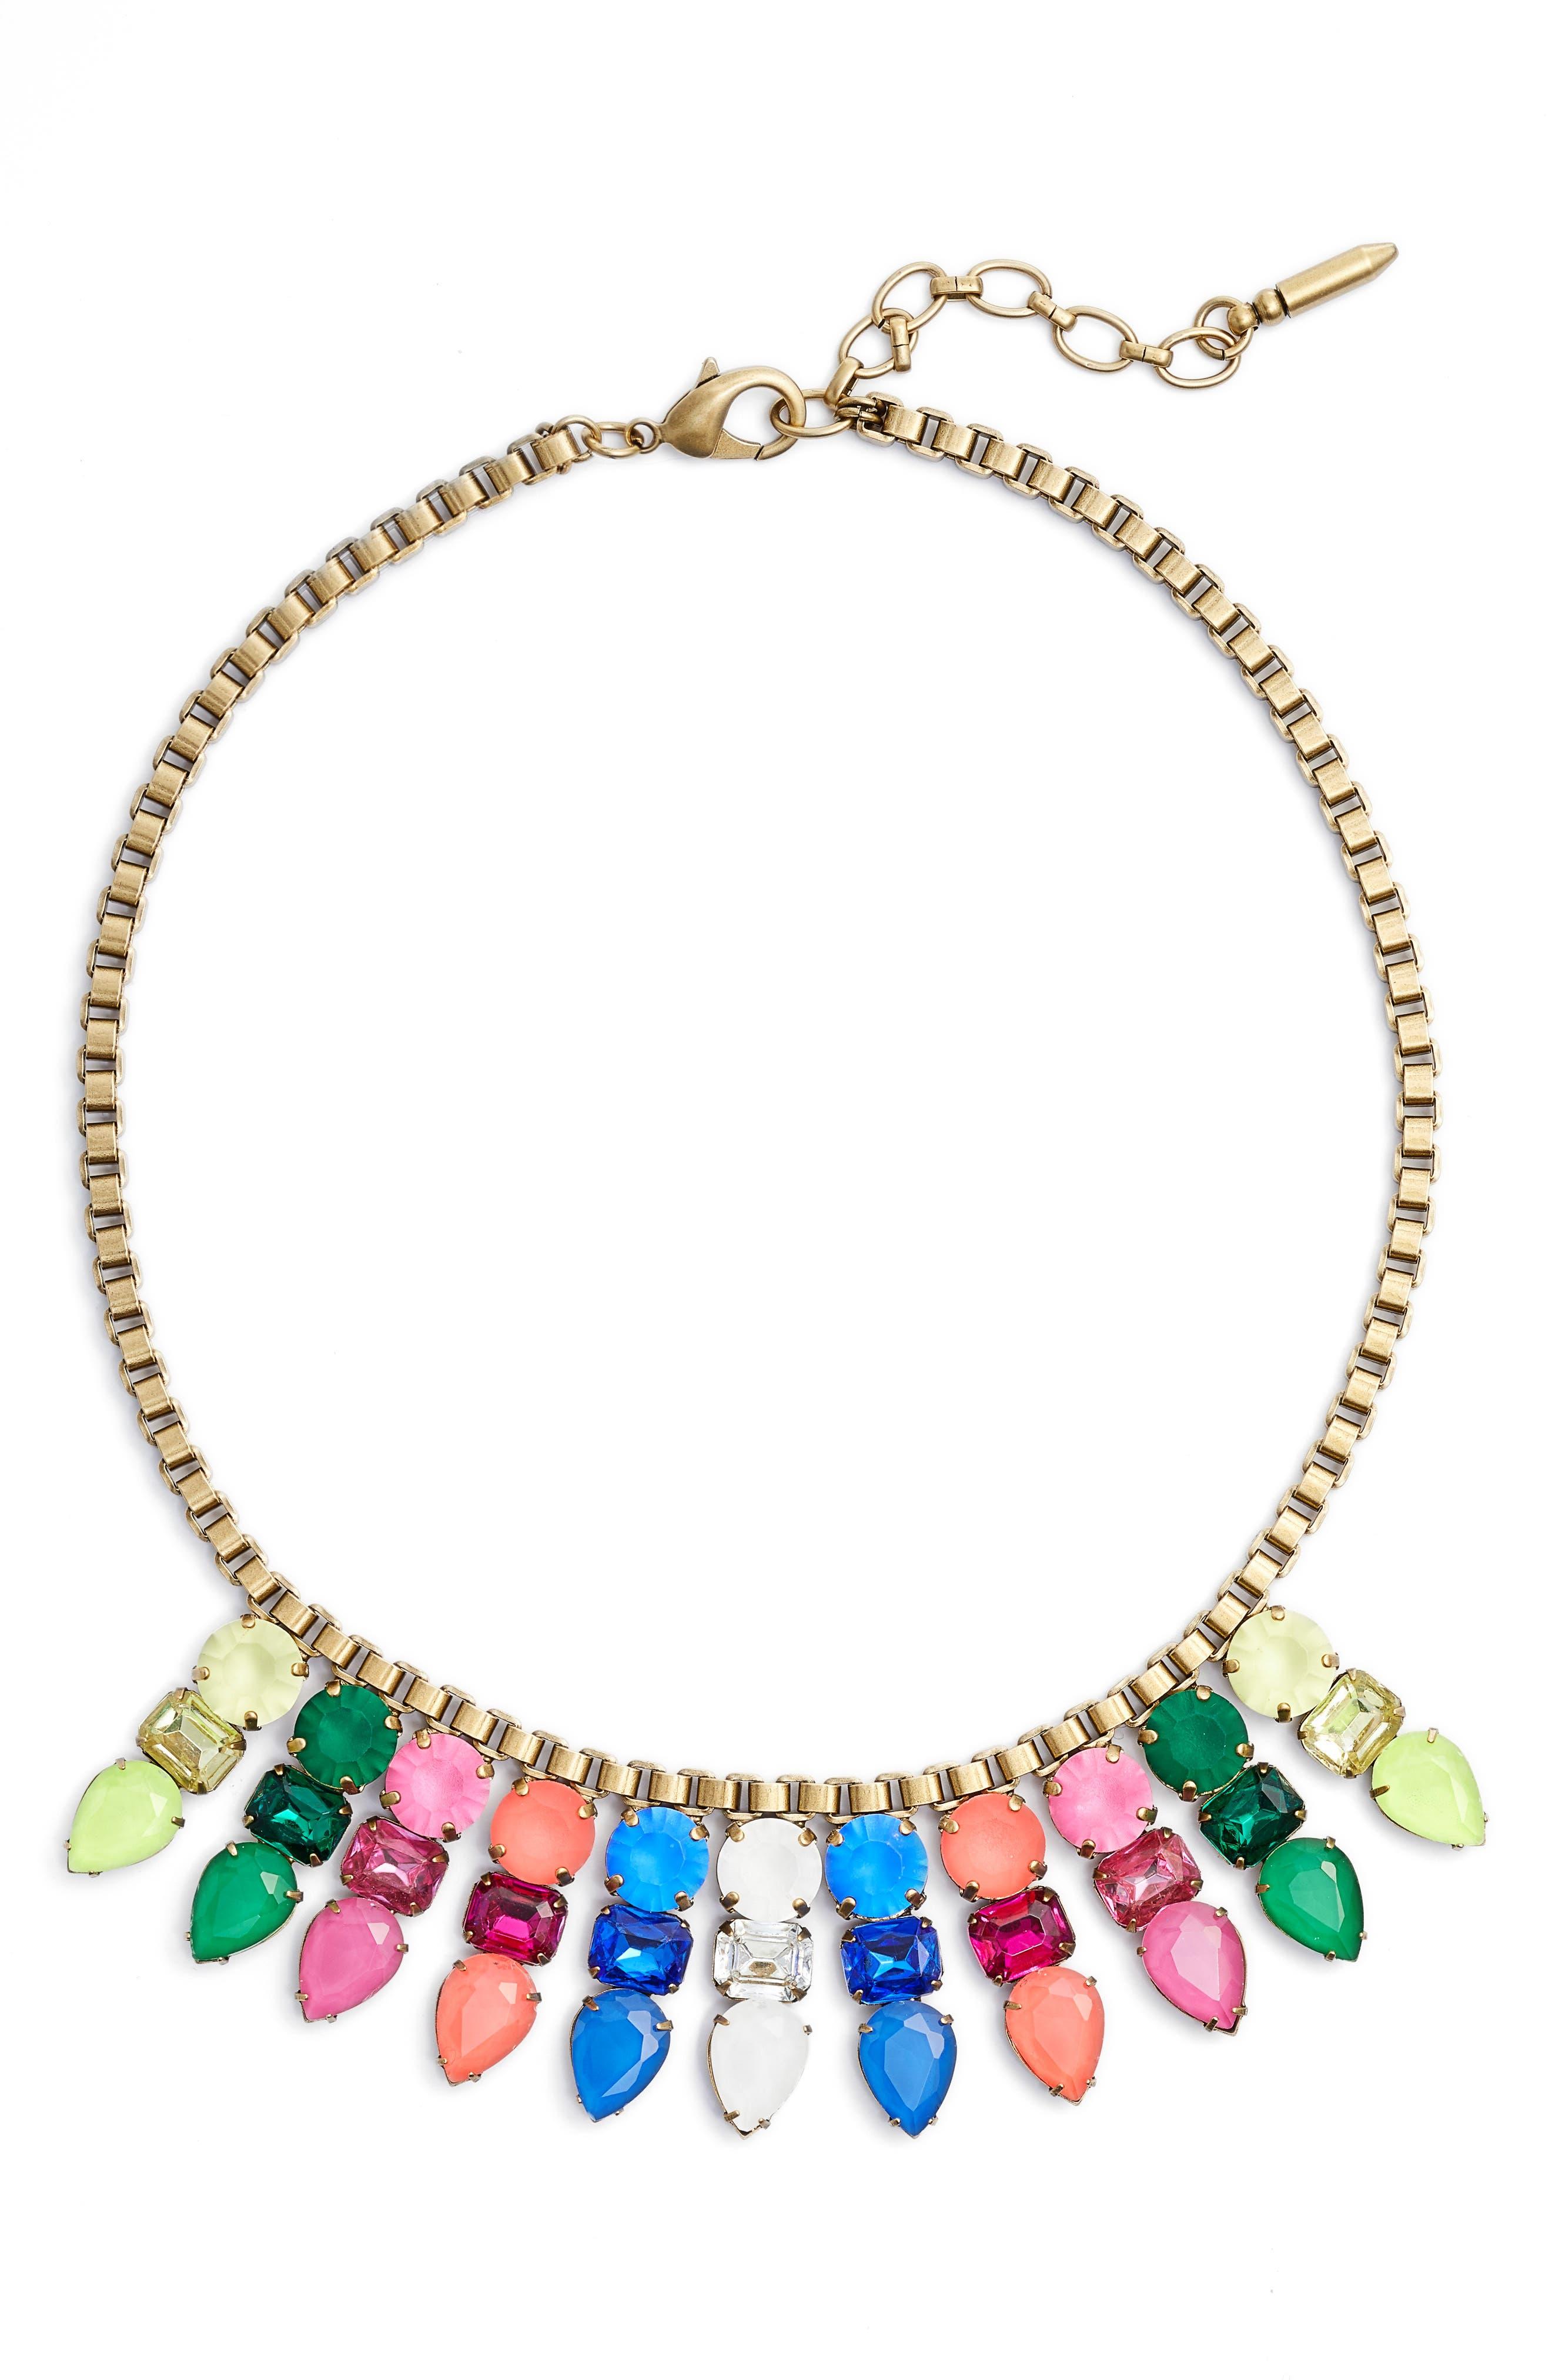 Loren Hope Jewel Bib Necklace